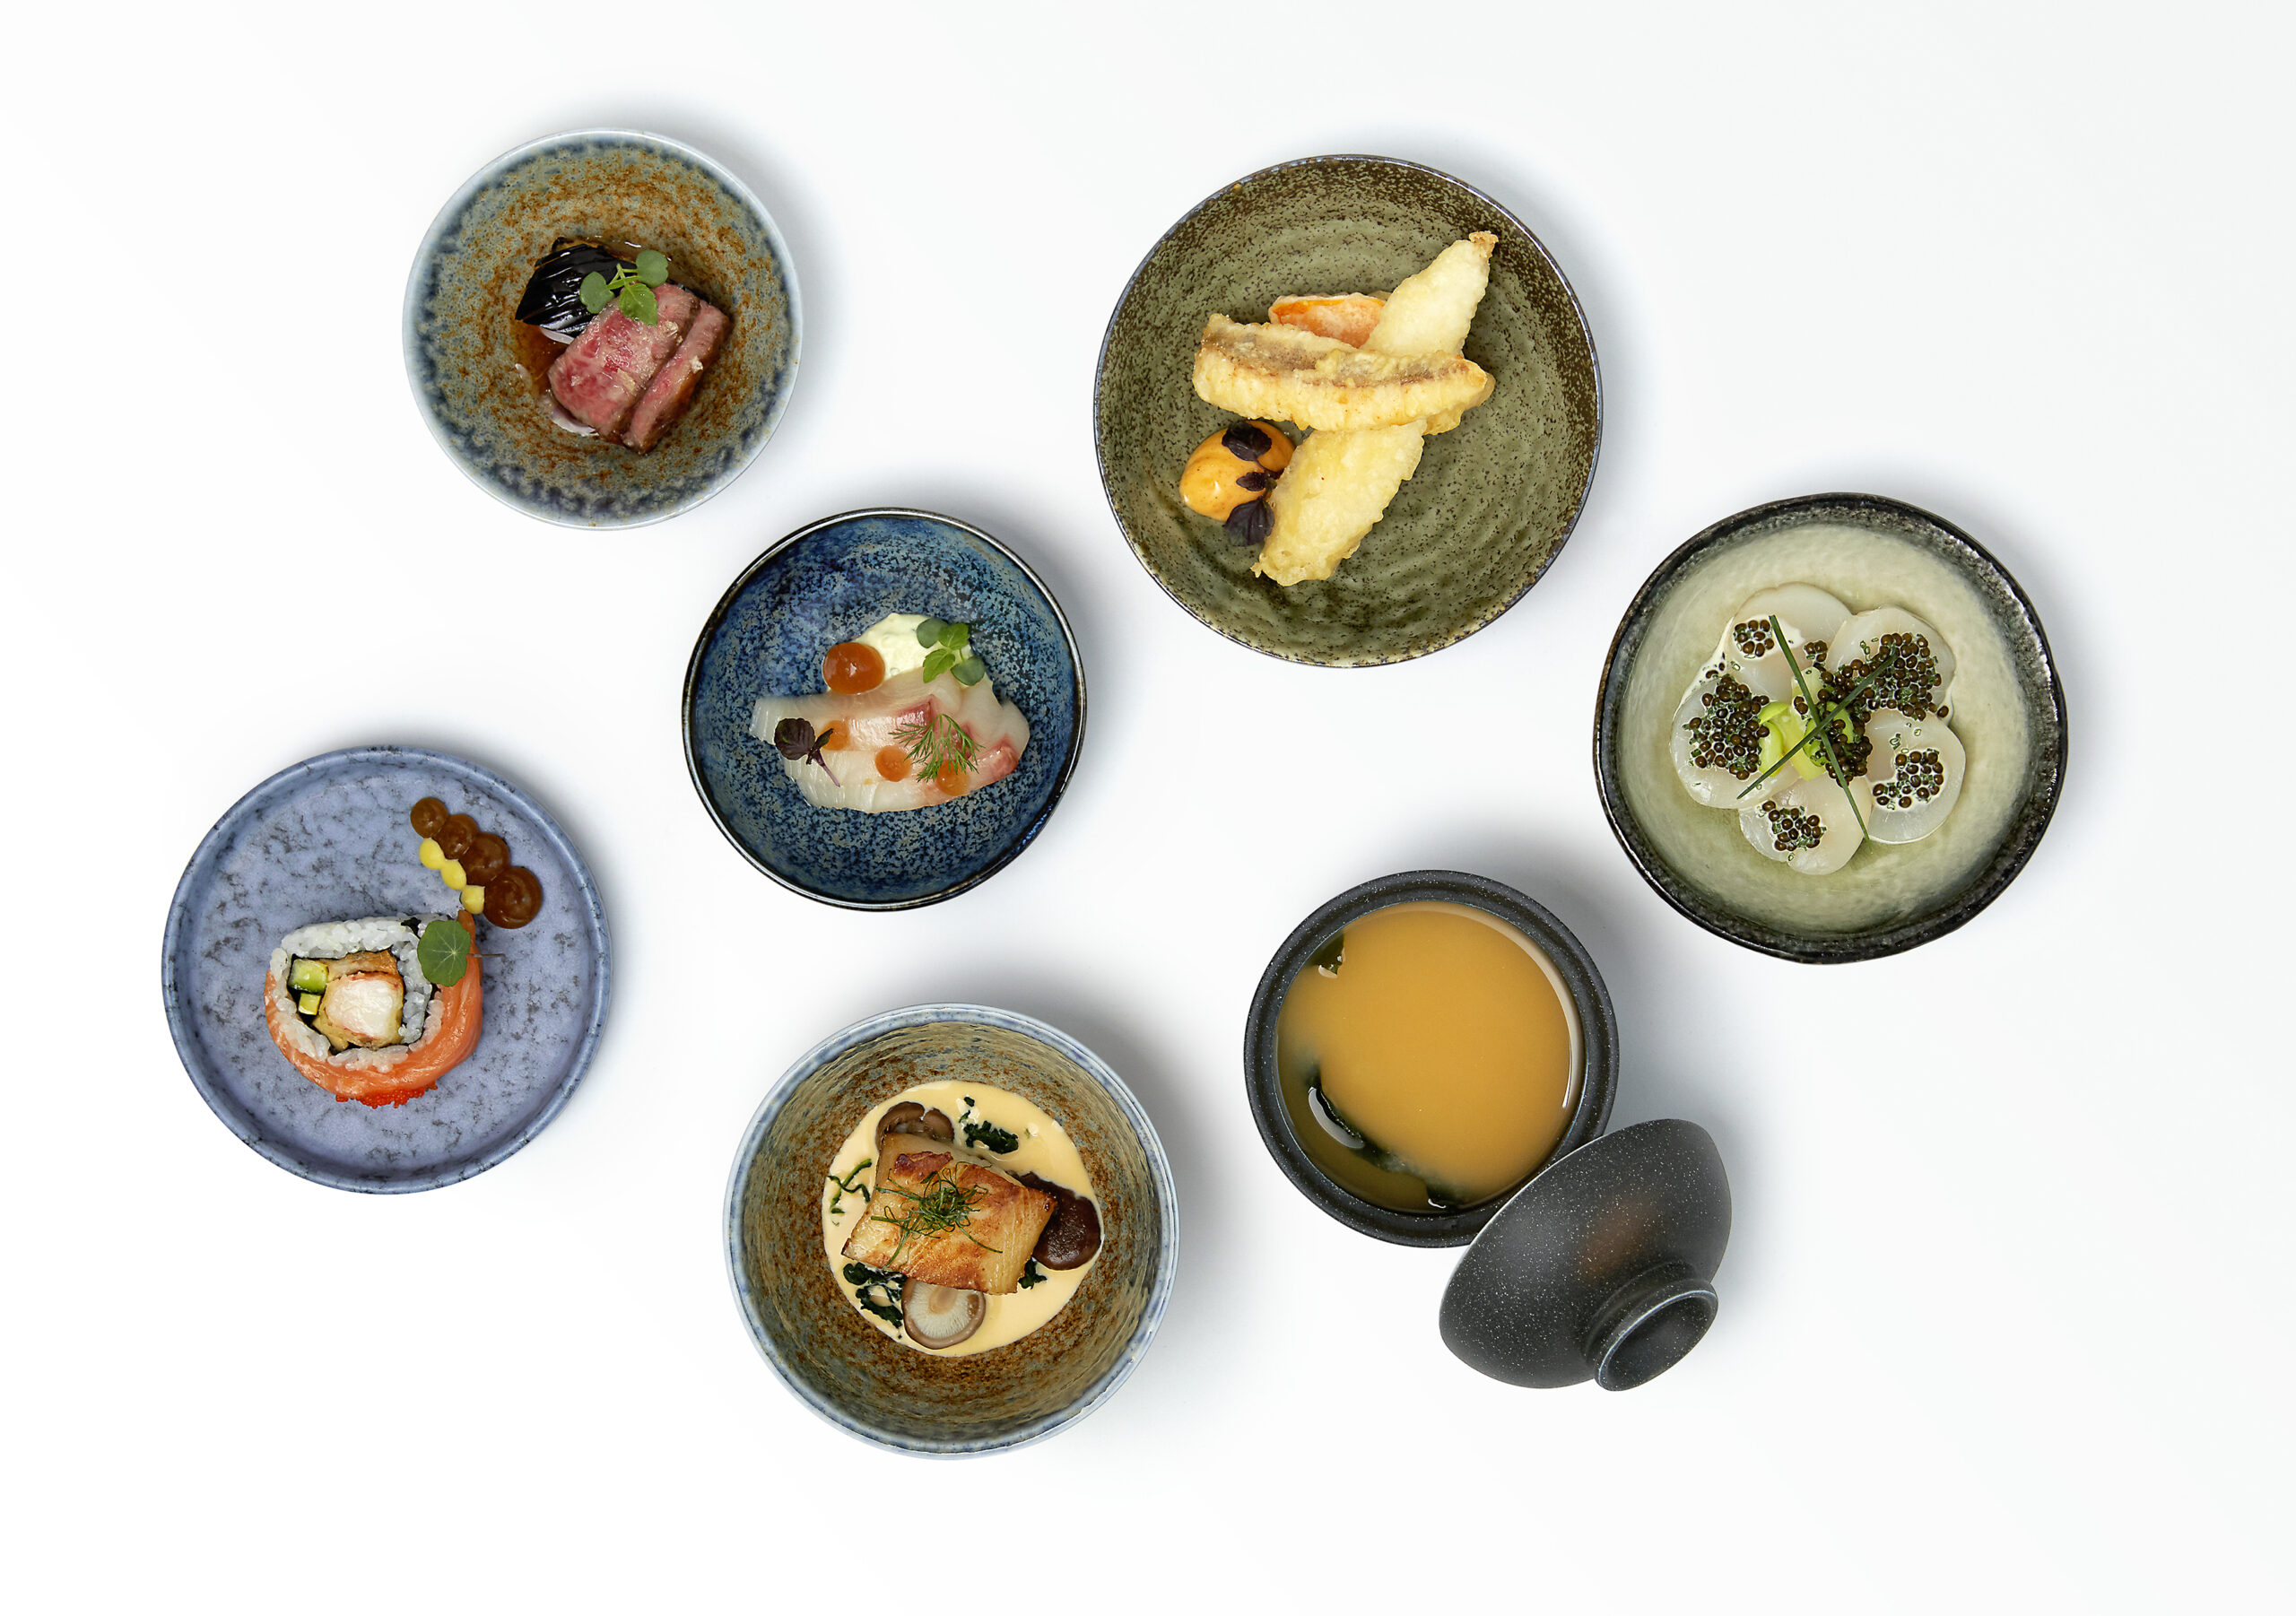 Beautiful presentation of dishes